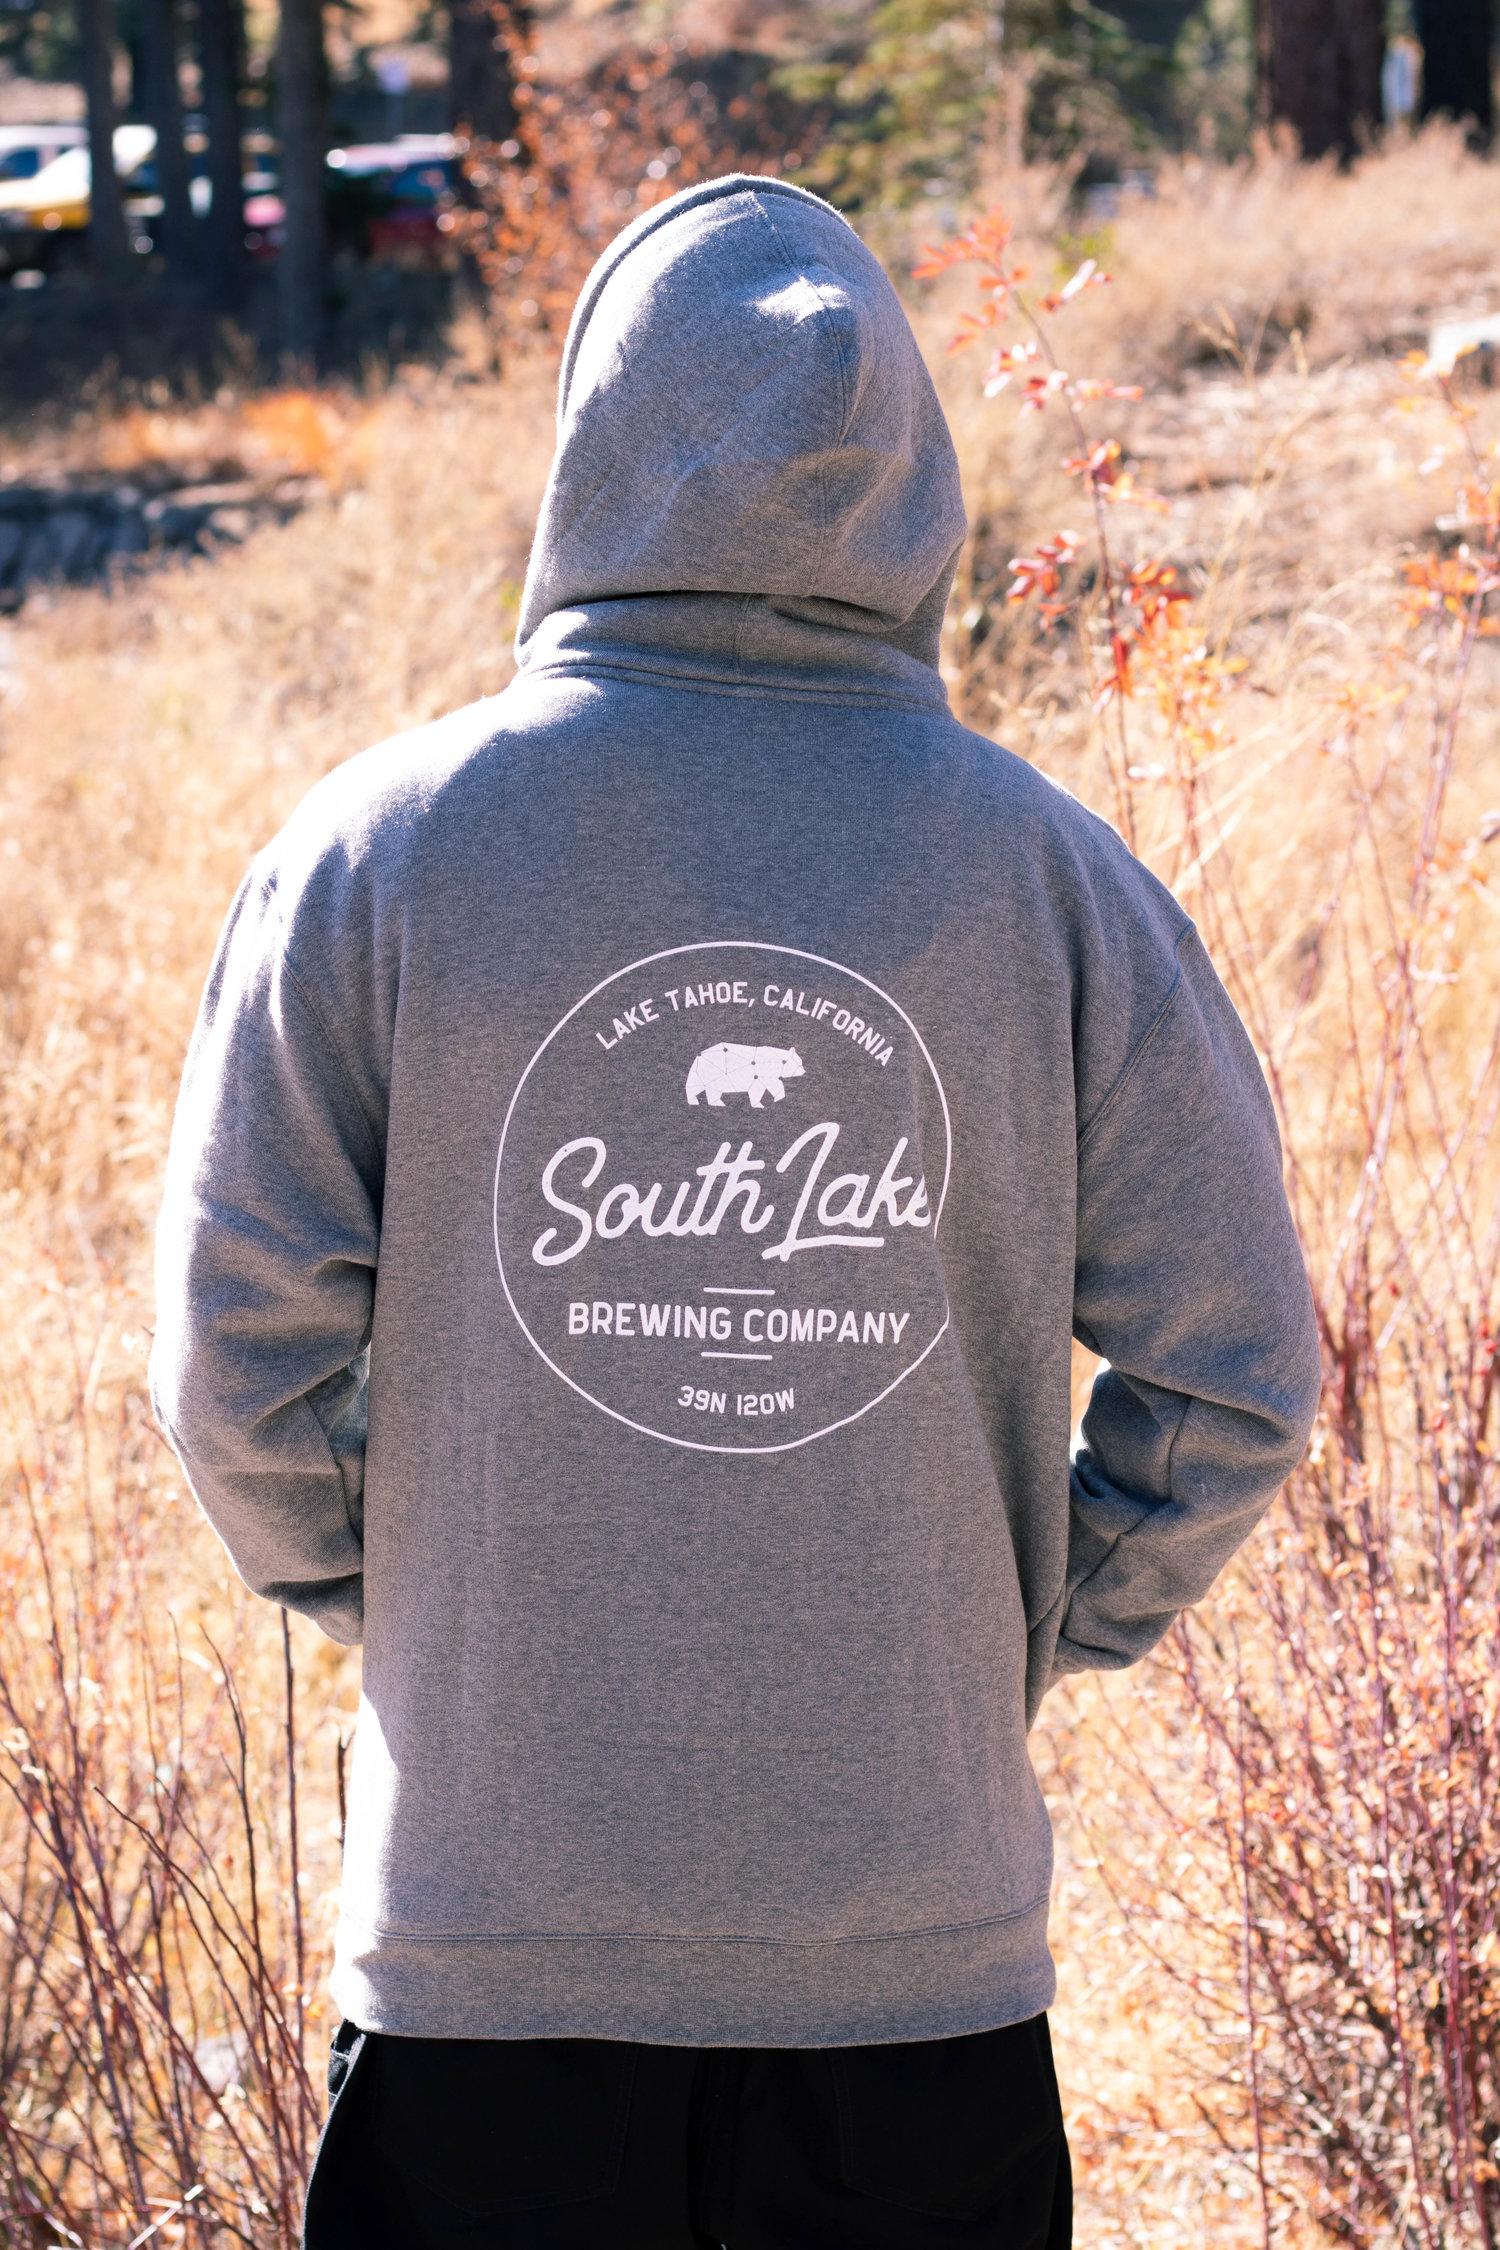 Hoodie Graphic by Perspektiiv Design Co. a Brand Designer in Portland, Oregon